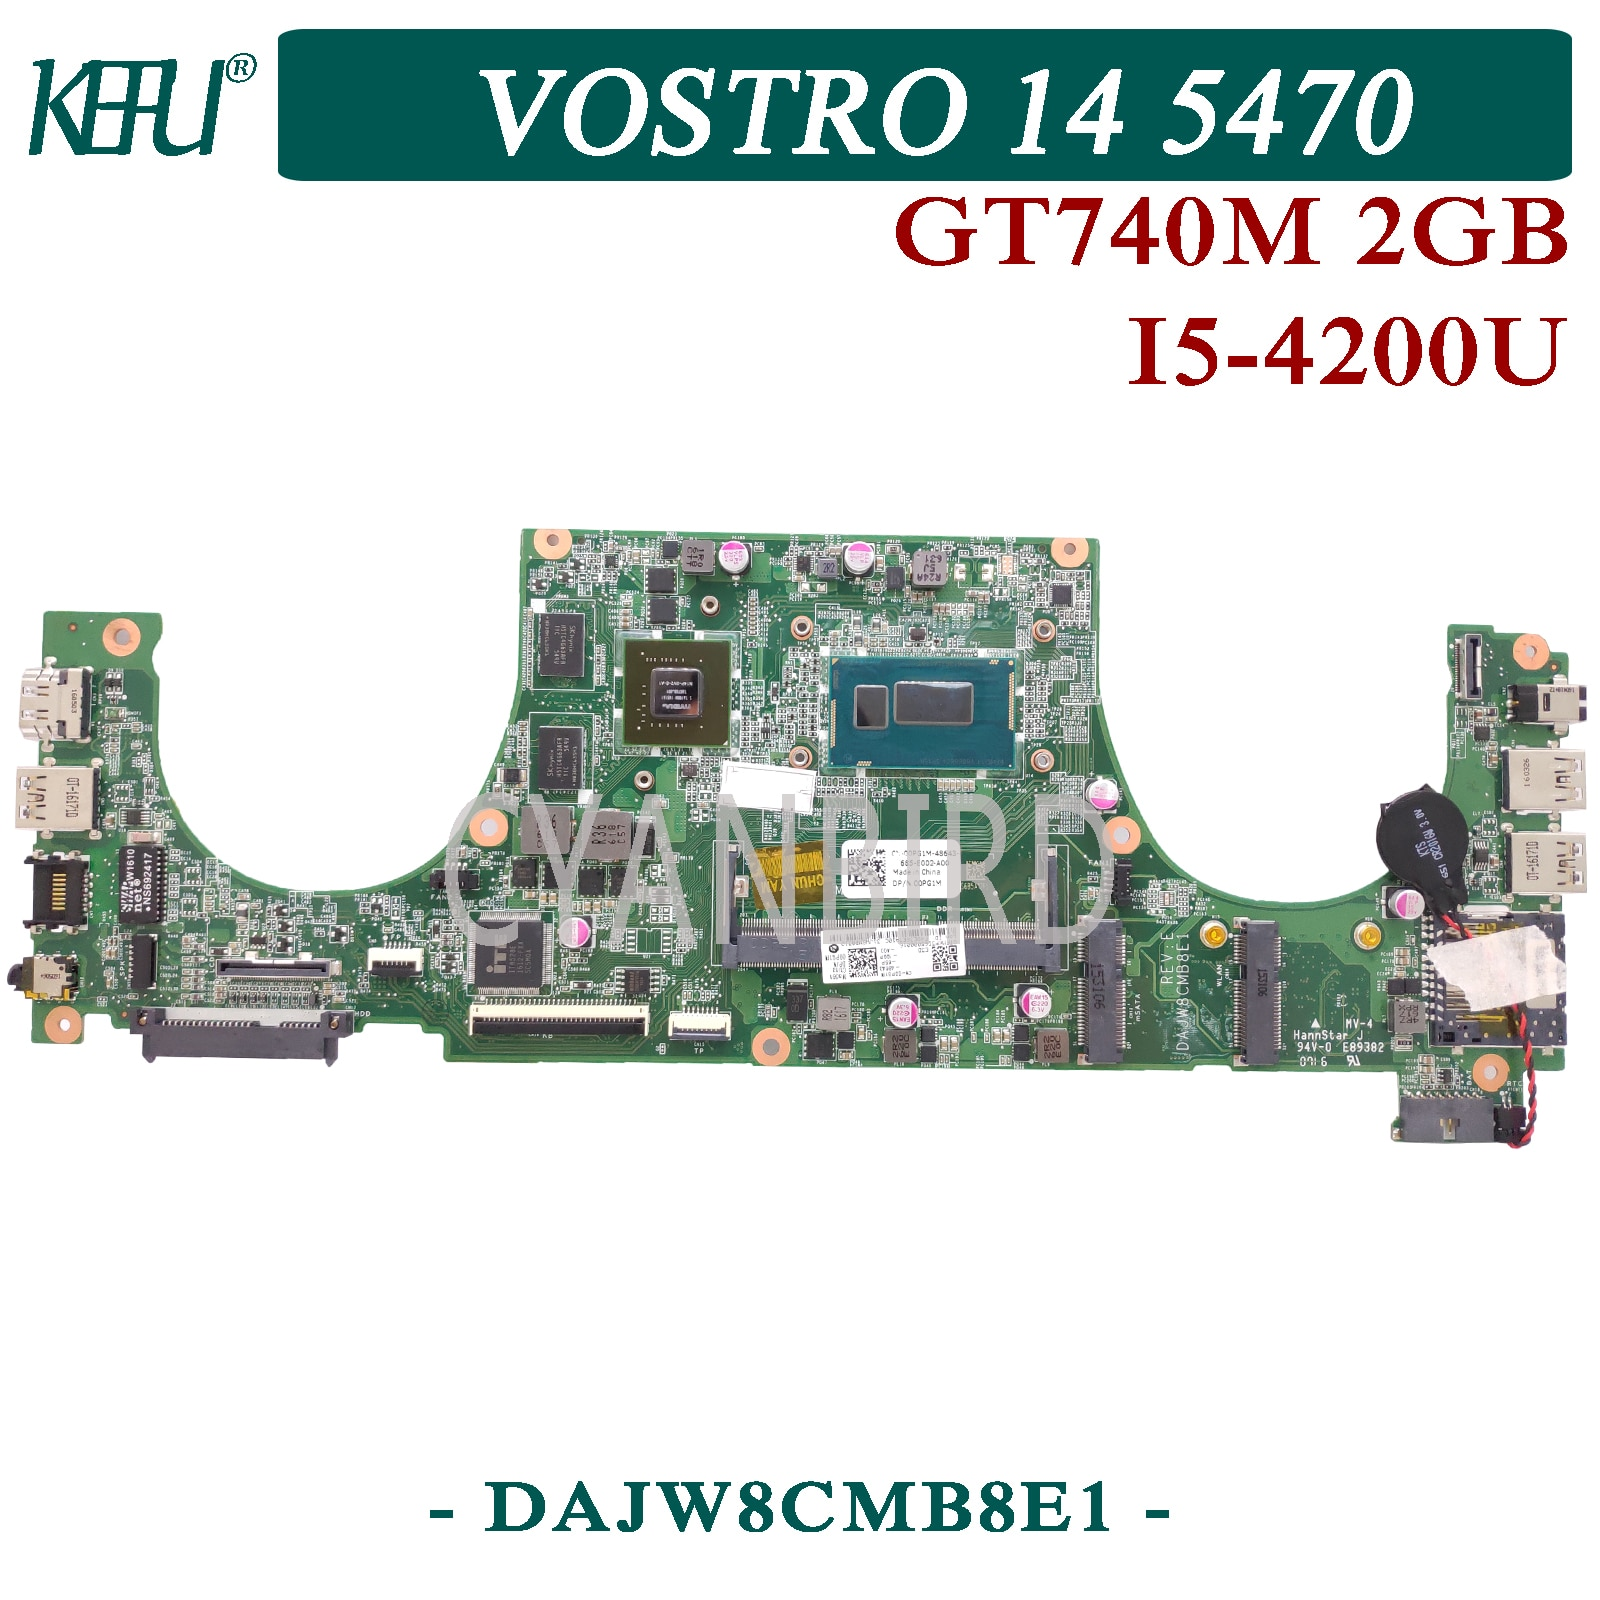 KEFU DAJW8CMB8E1 اللوحة الرئيسية الأصلية لديل Vostro 14-5470 DDR3L مع I5-4210U/4200U GT740M-2GB اللوحة الأم للكمبيوتر المحمول